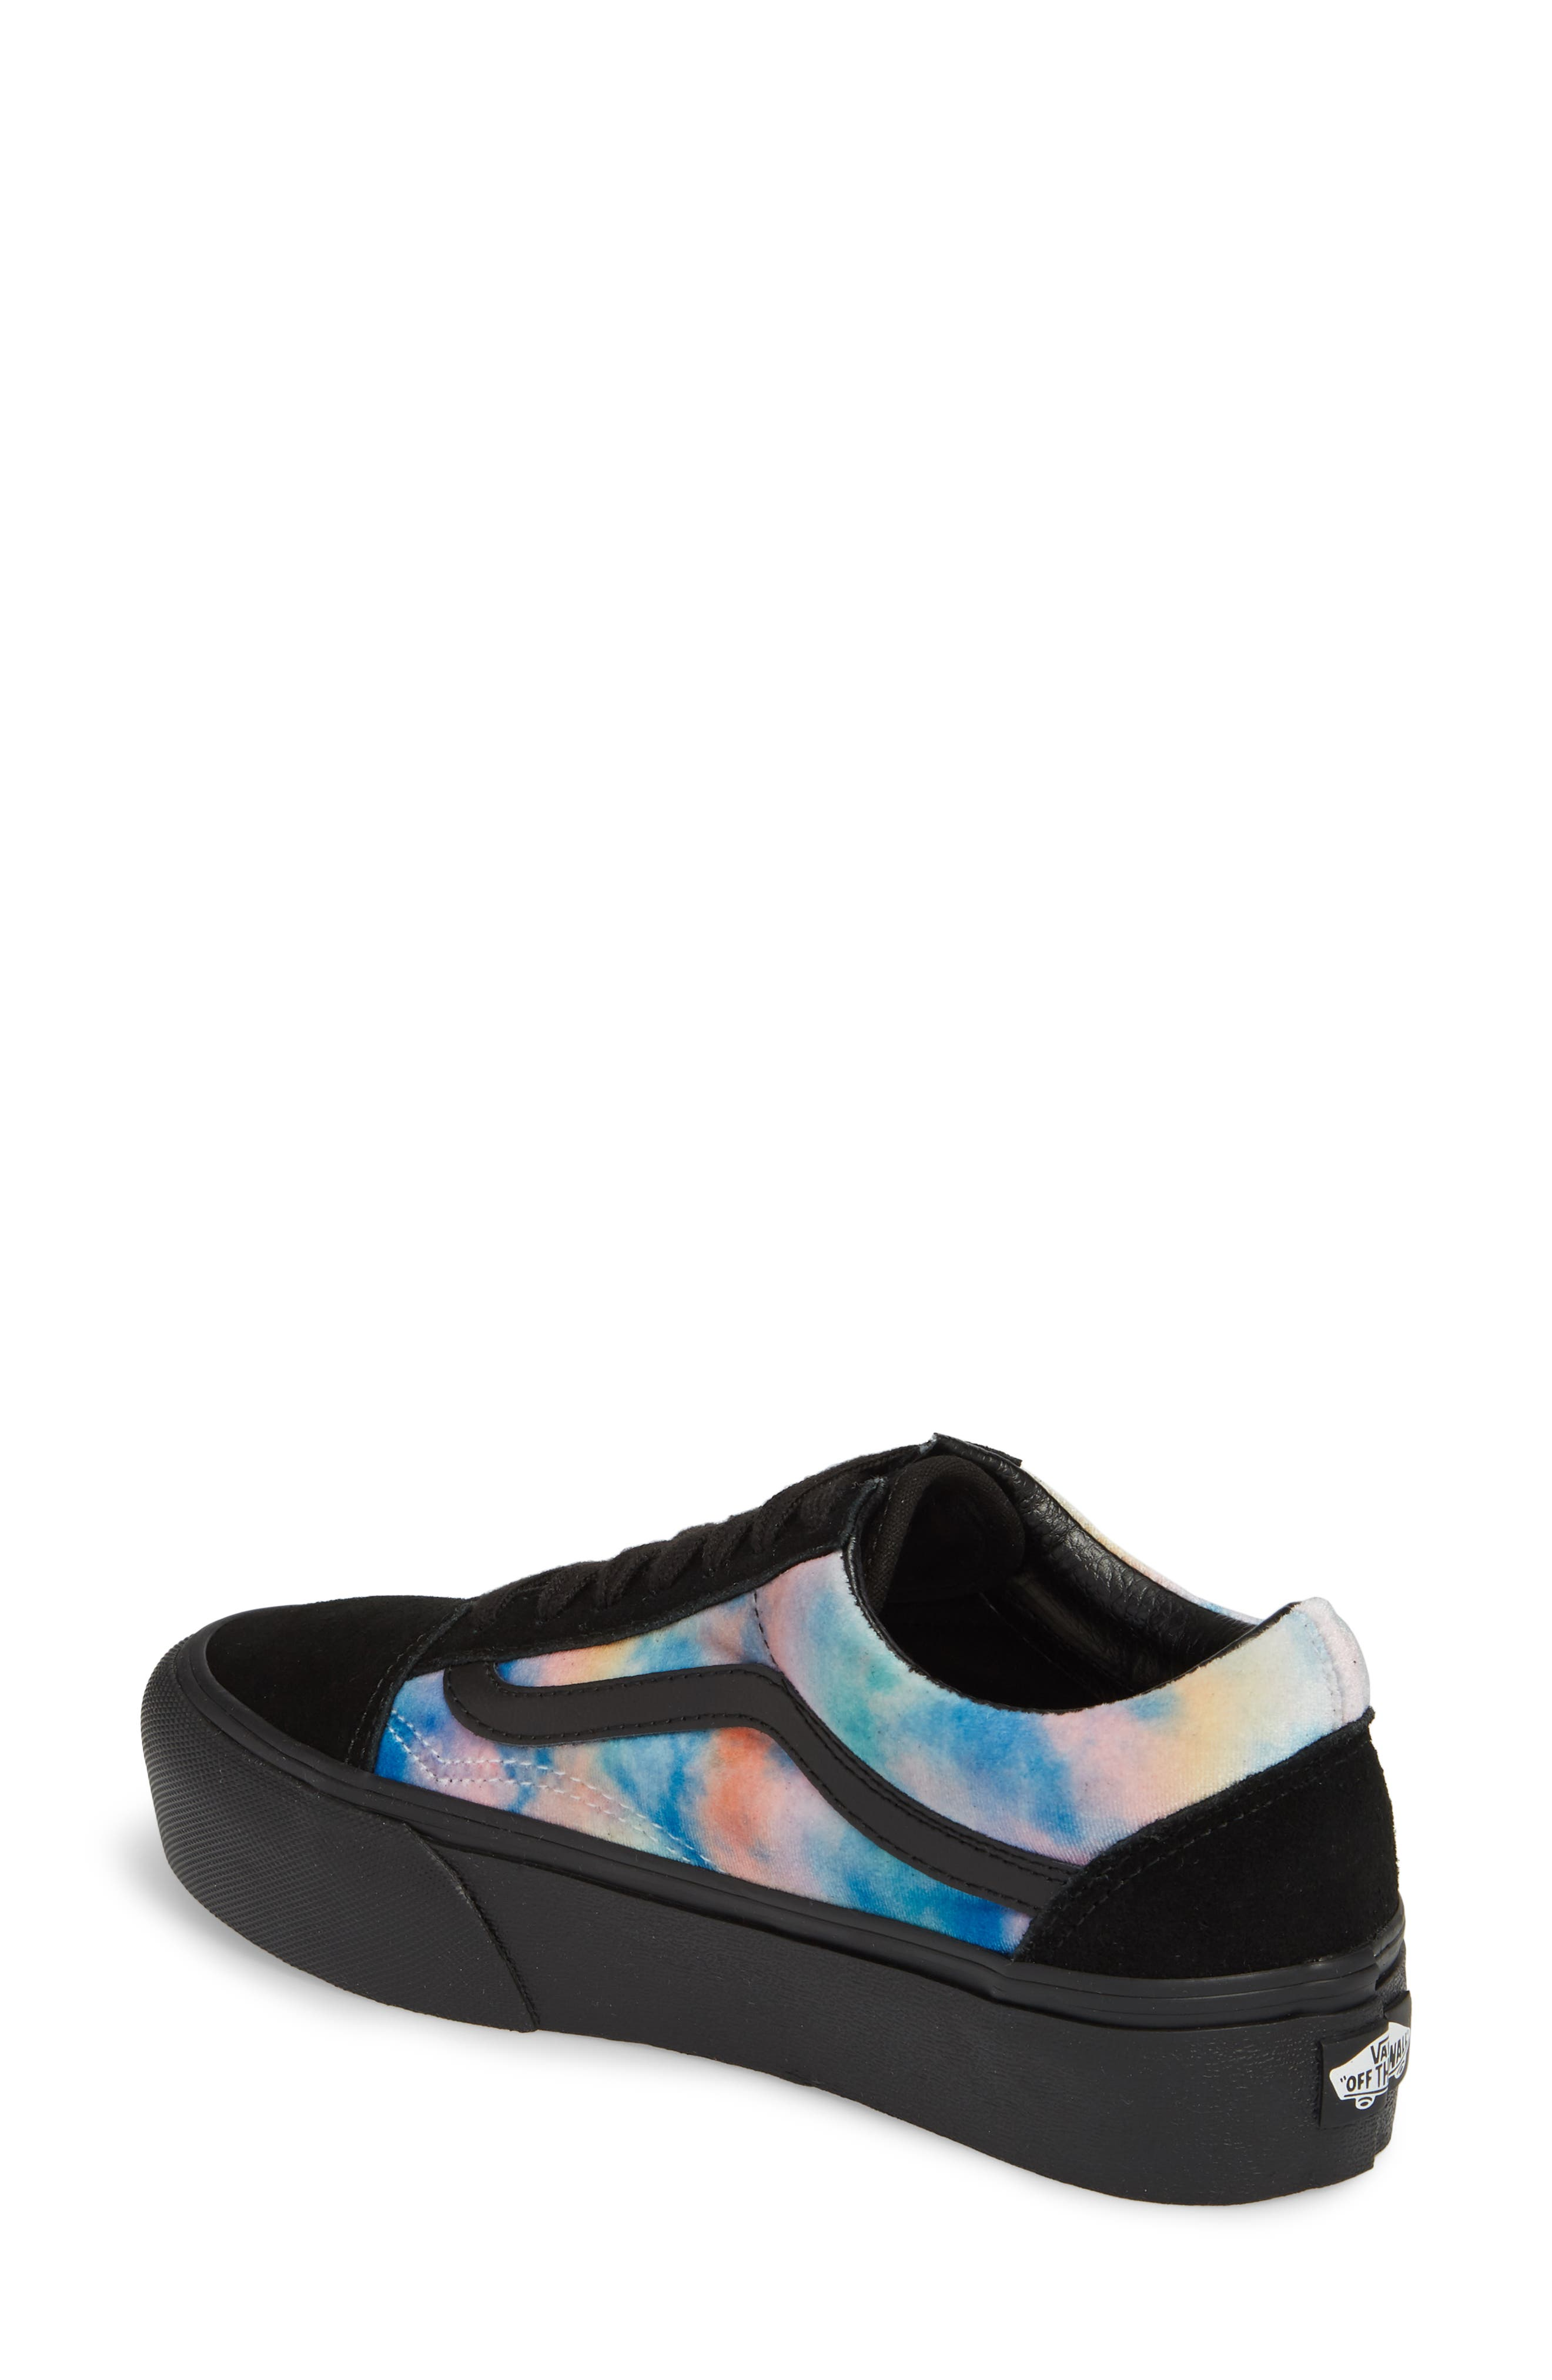 Old Skool Platform Sneaker,                             Alternate thumbnail 7, color,